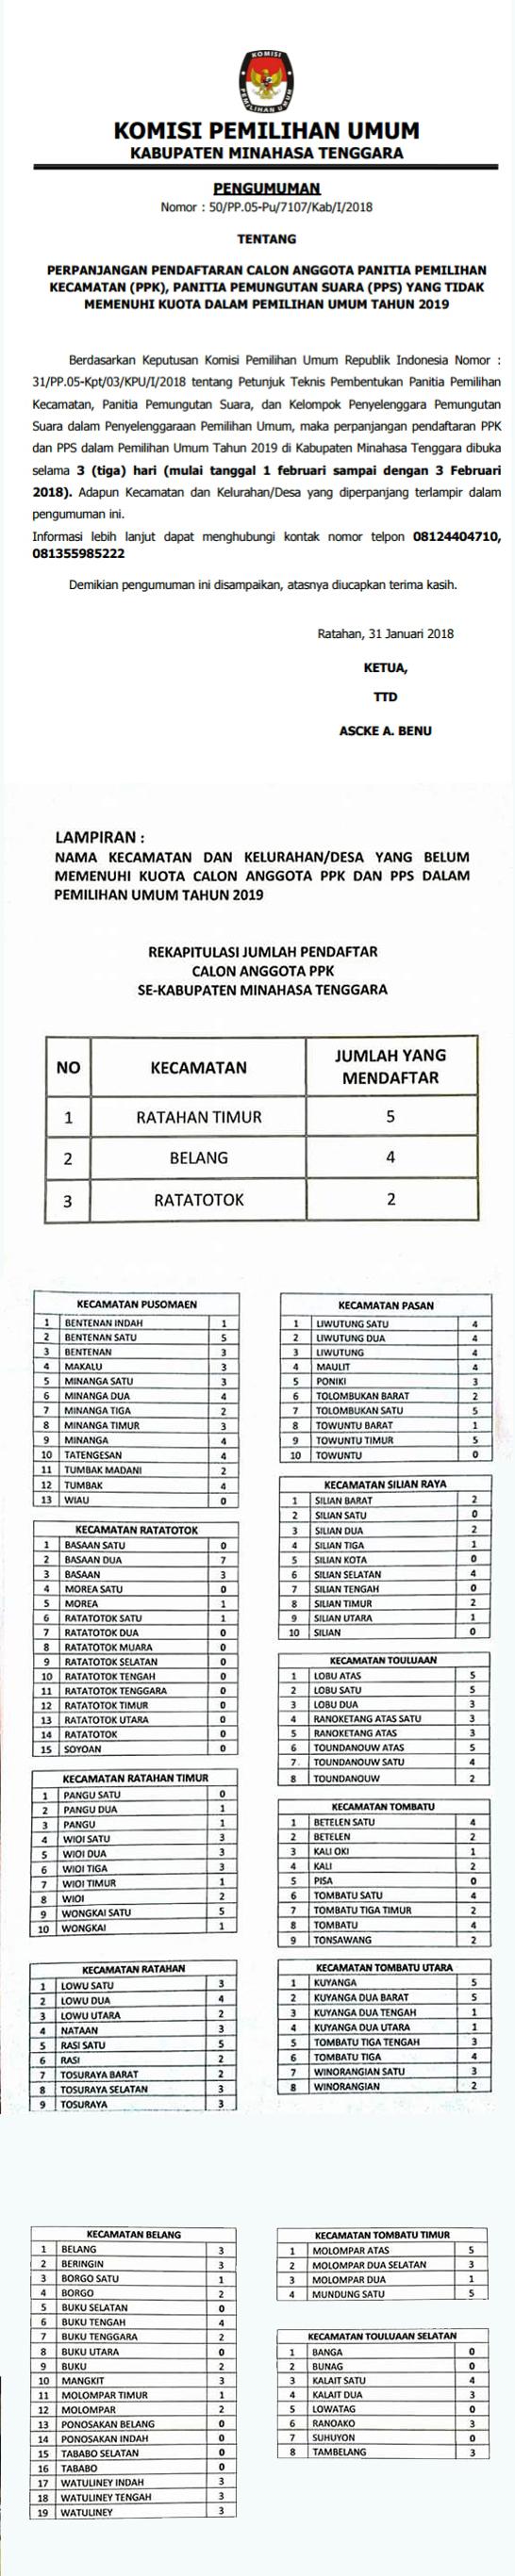 Perpanjangan Pendaftaran Calon PPK-PPS Pileg 2019 Kabupaten Minahasa Tenggara